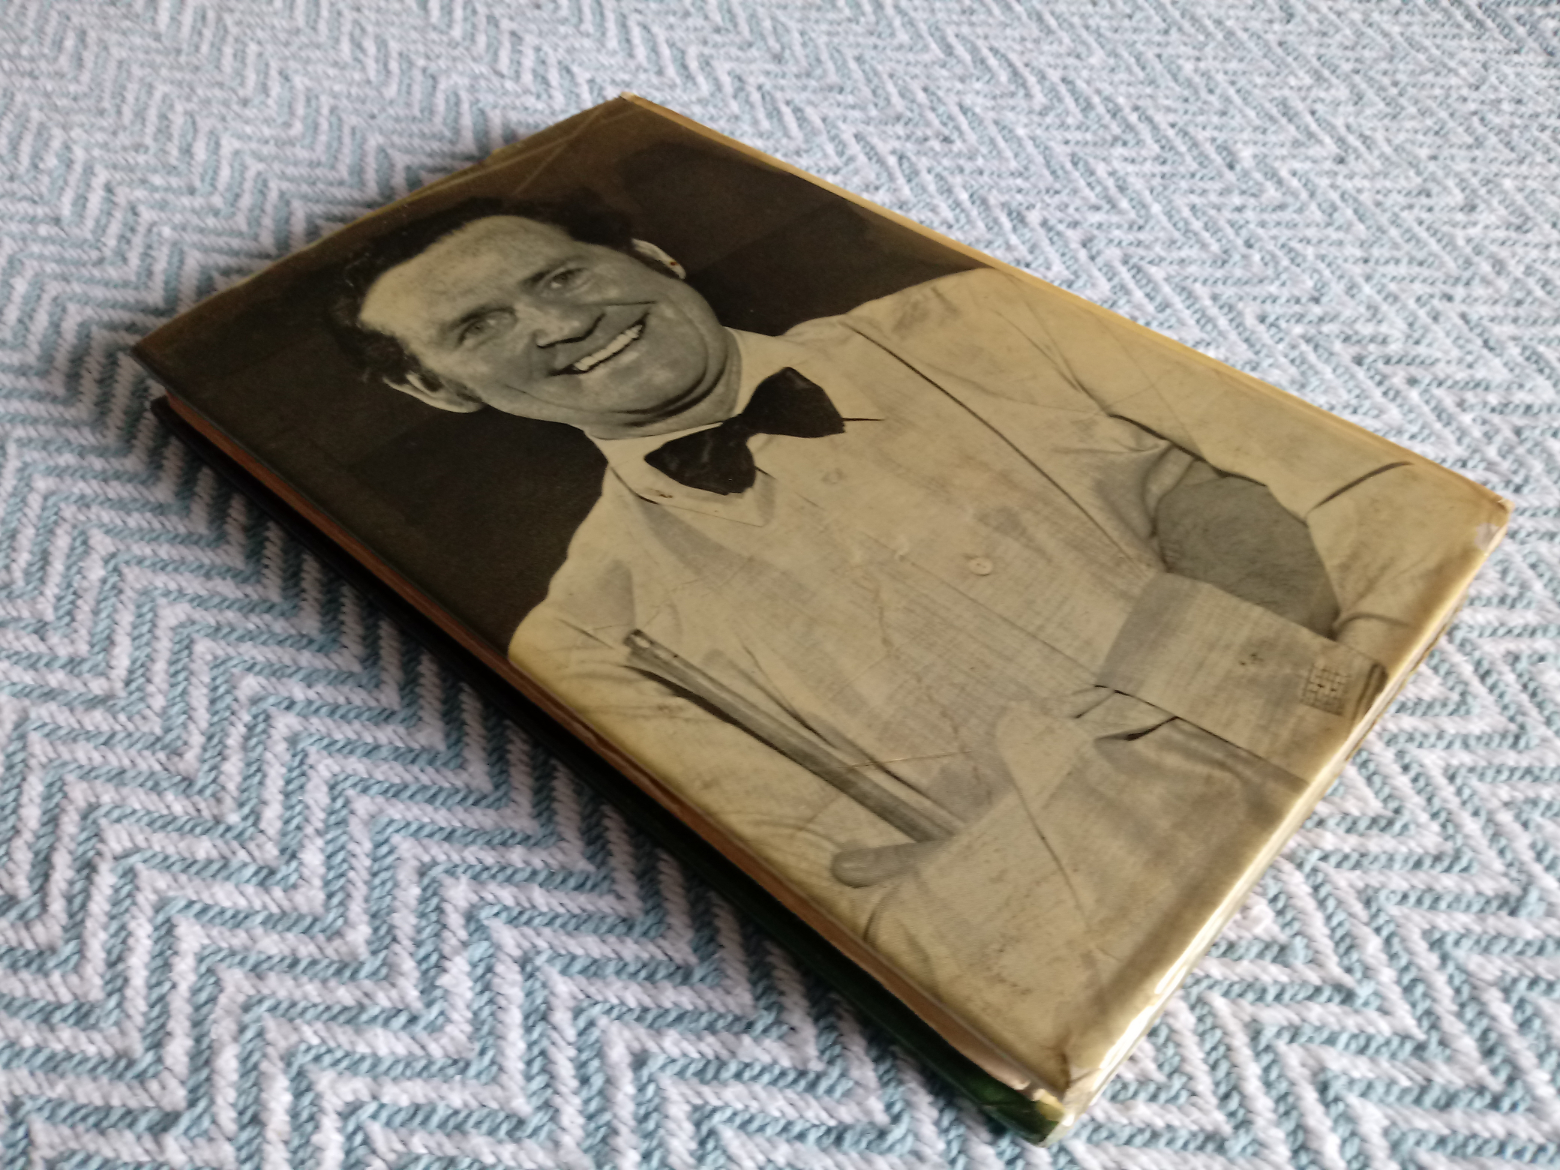 Billiards & Snooker hardback book by Jack Karnehm. Published 1973 by Pelham Books. Dust jacket